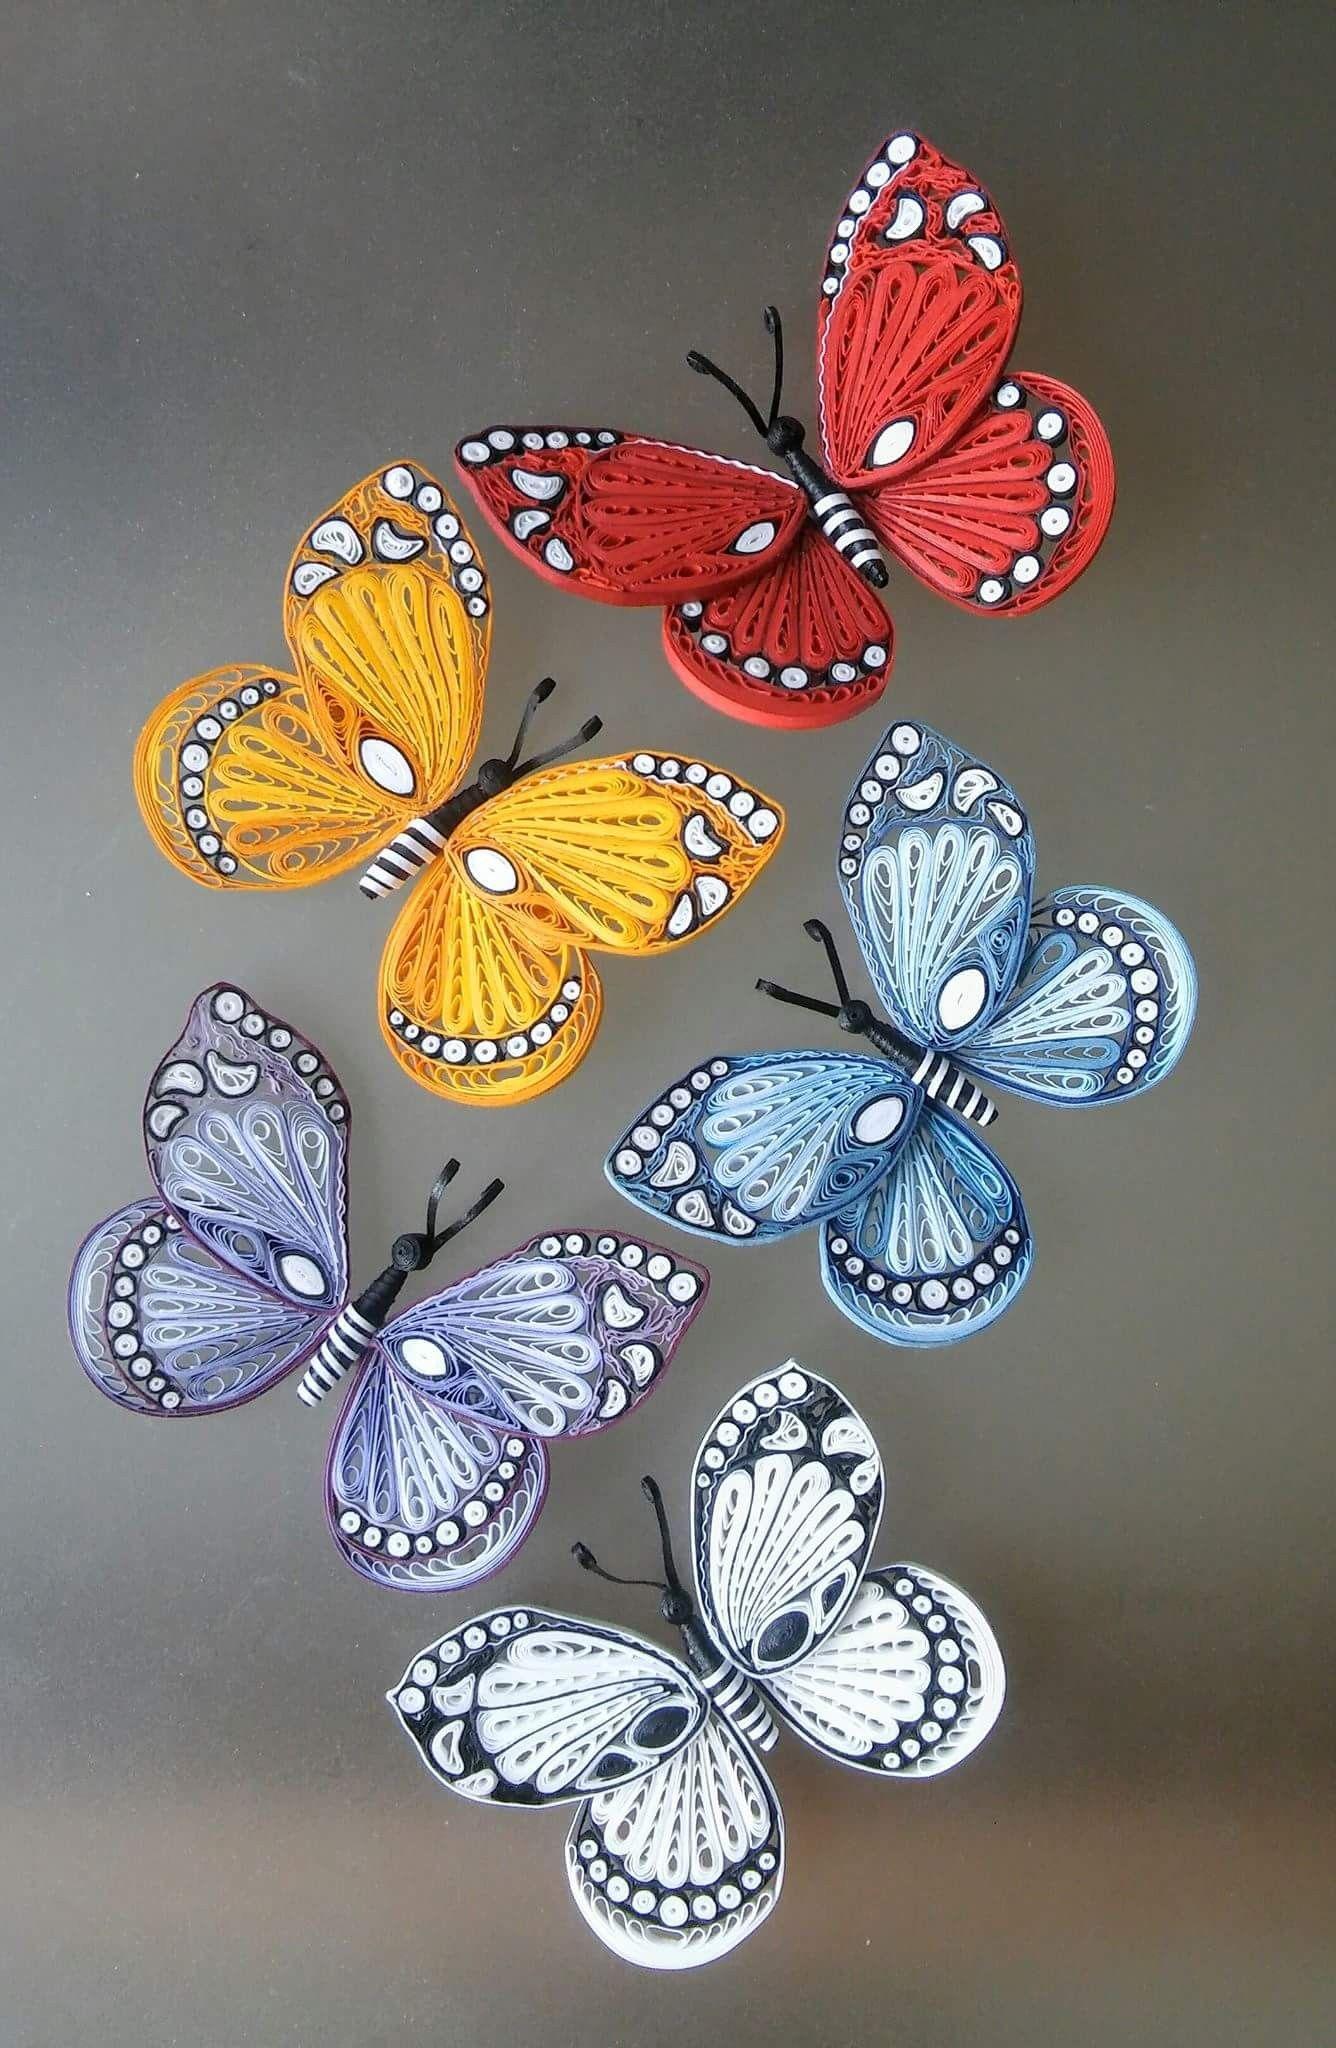 Autor Maria Cvetanova Quillingbutterfly Quillinginsects